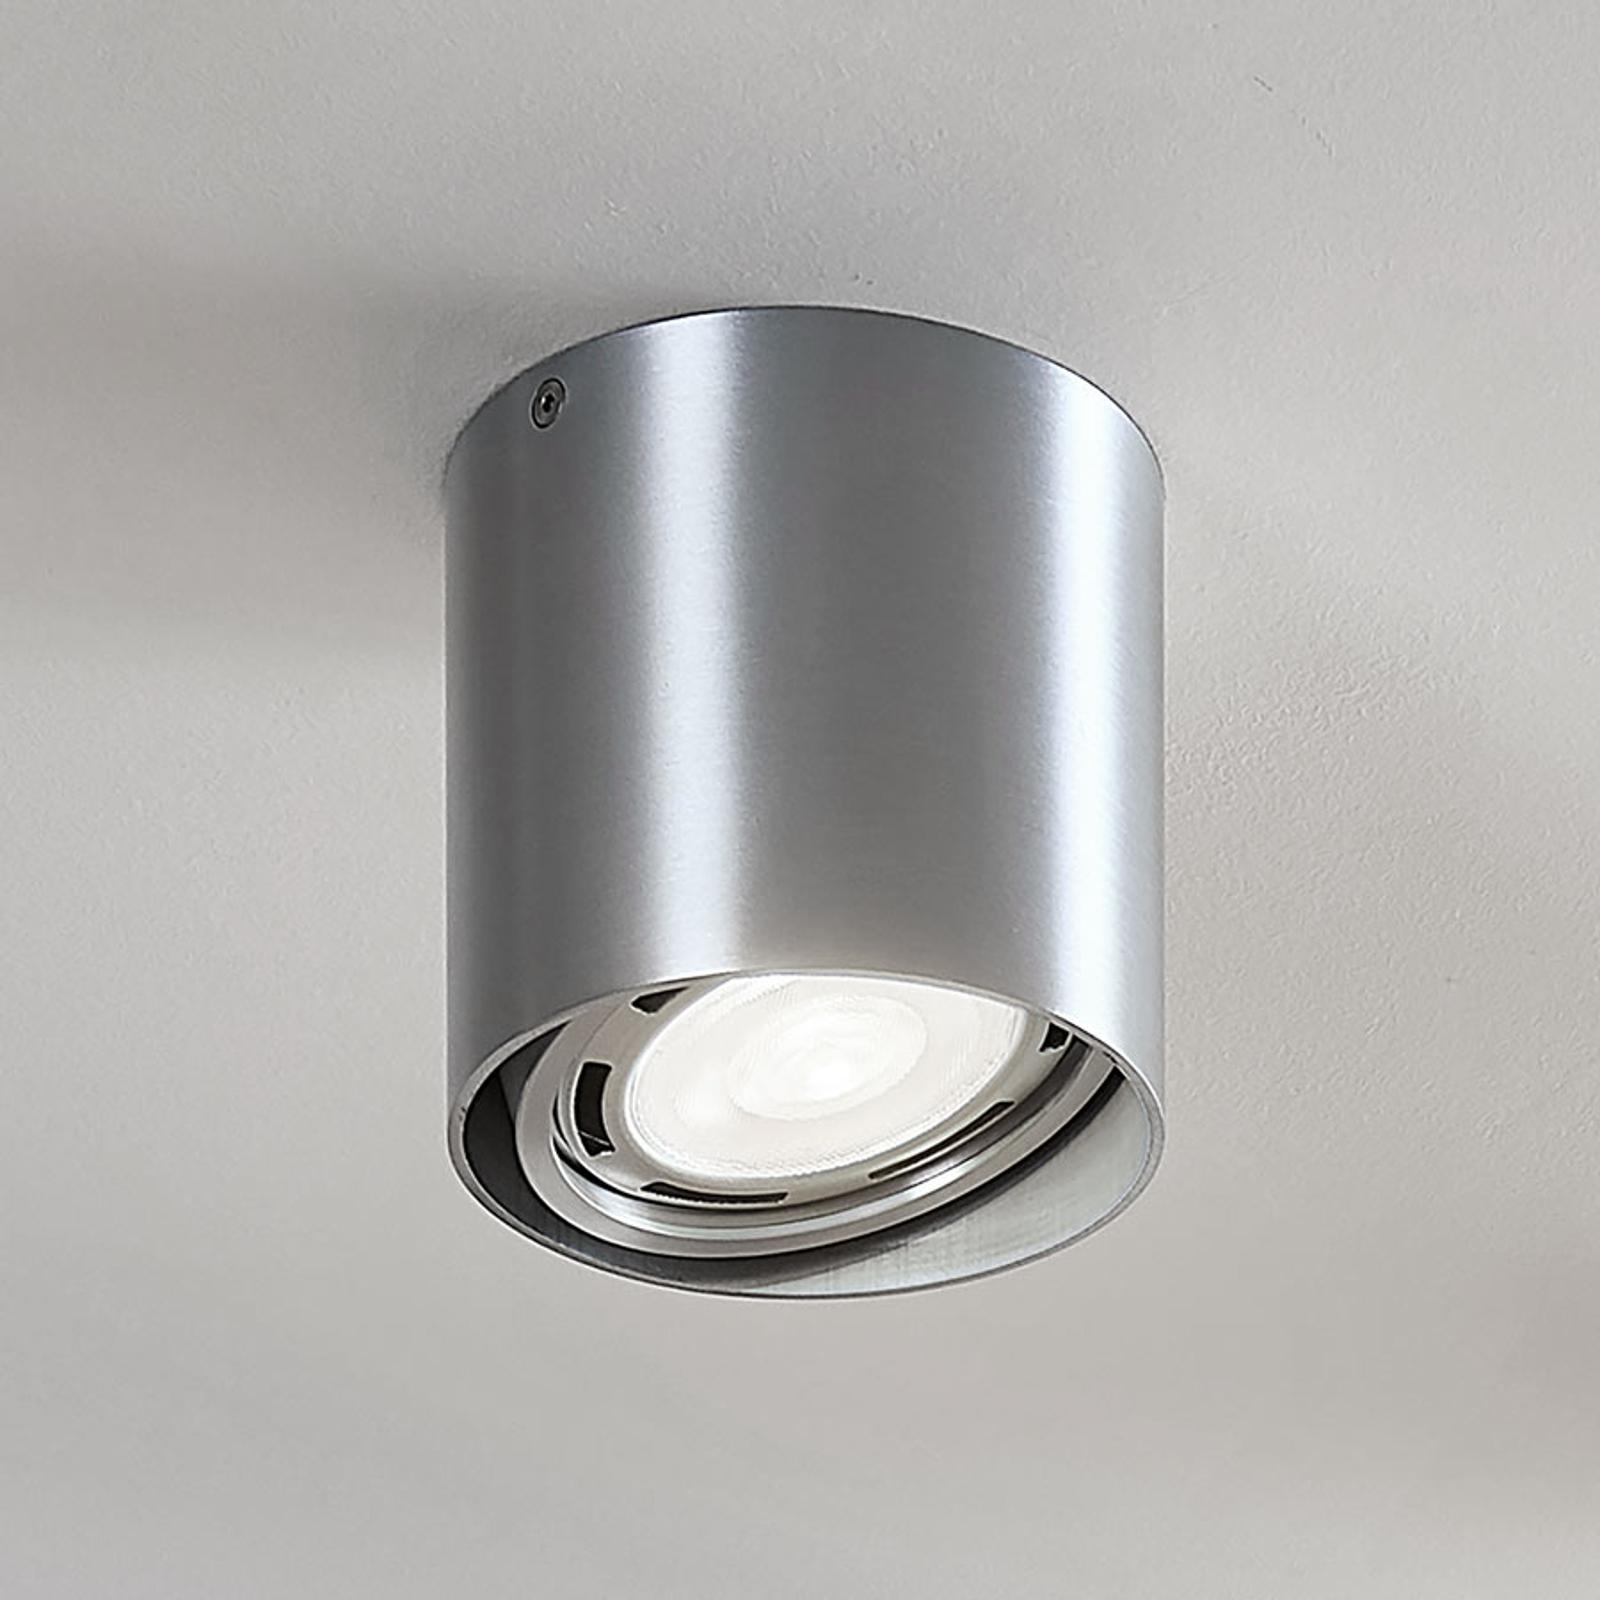 Downlight LED Rosalie, 1-pkt., okrągły, aluminium